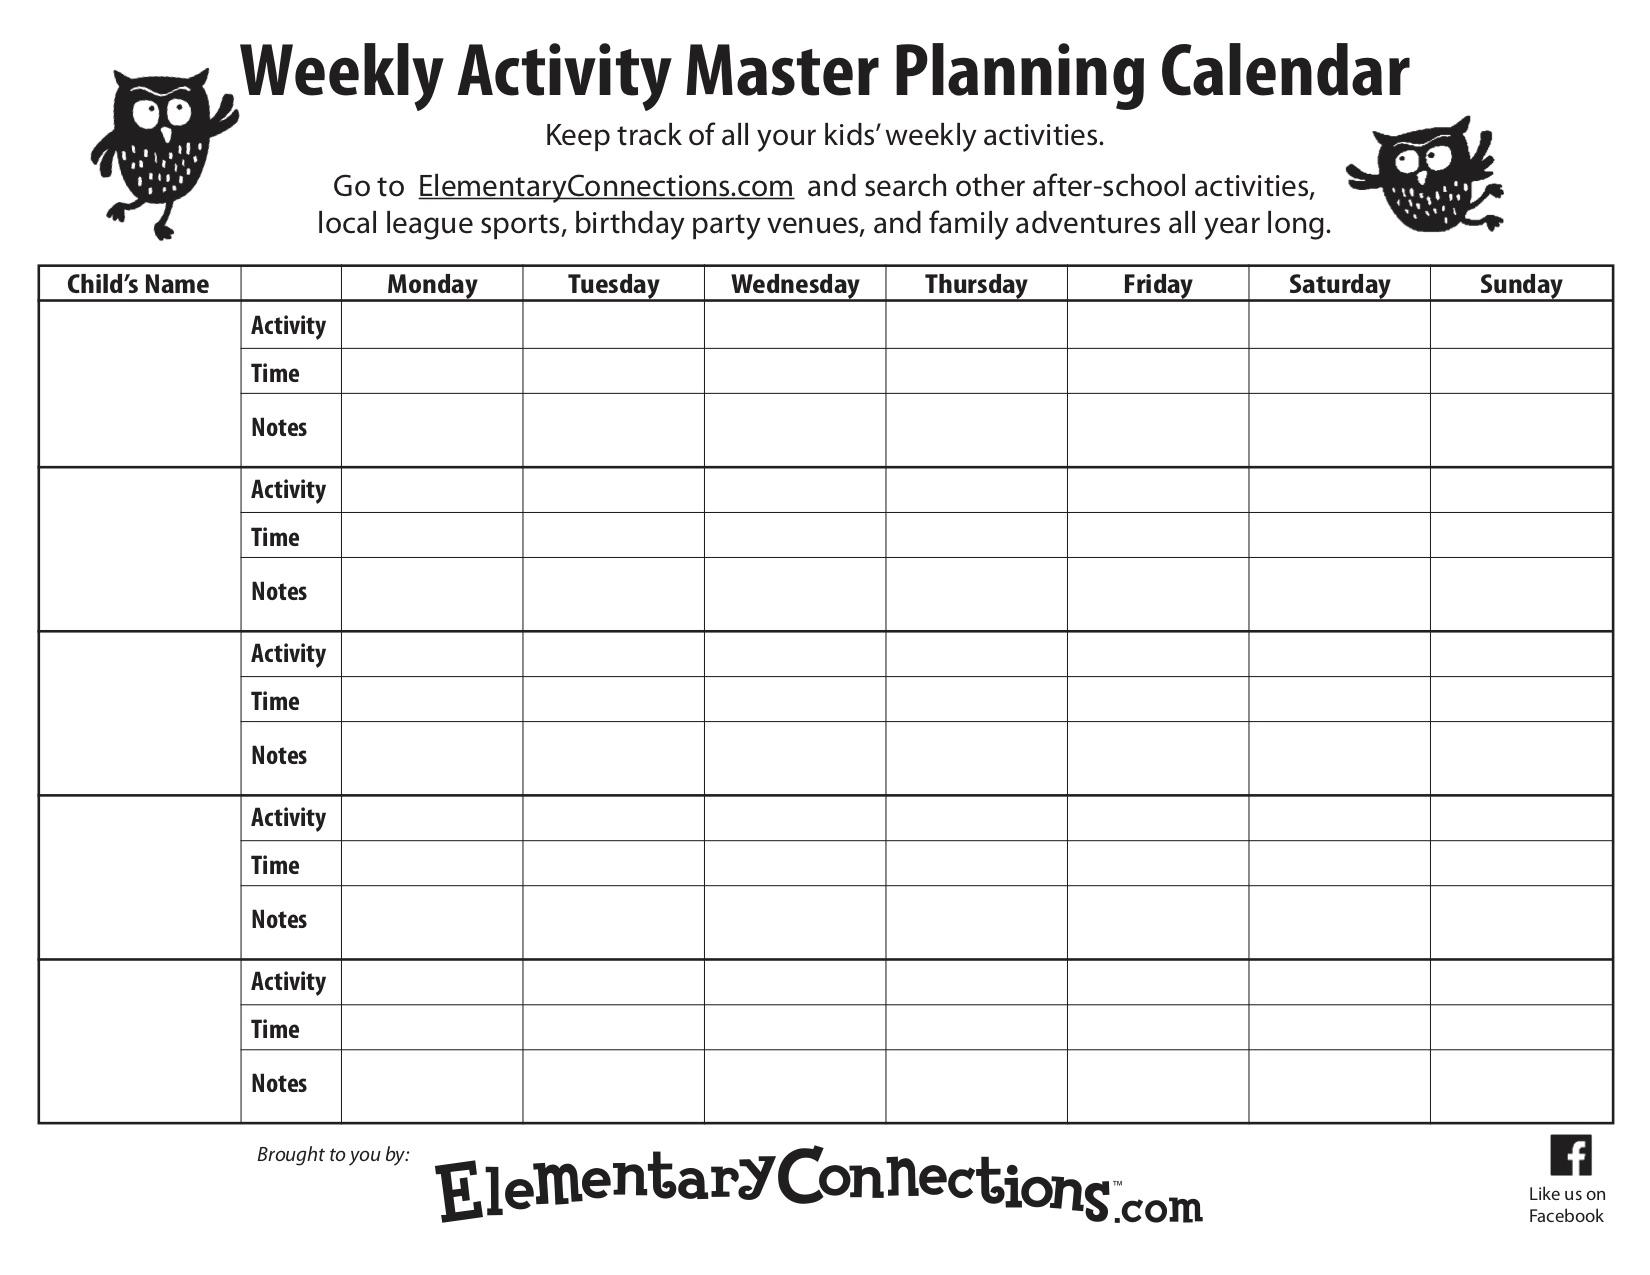 Weekly Activity Planning Calendar